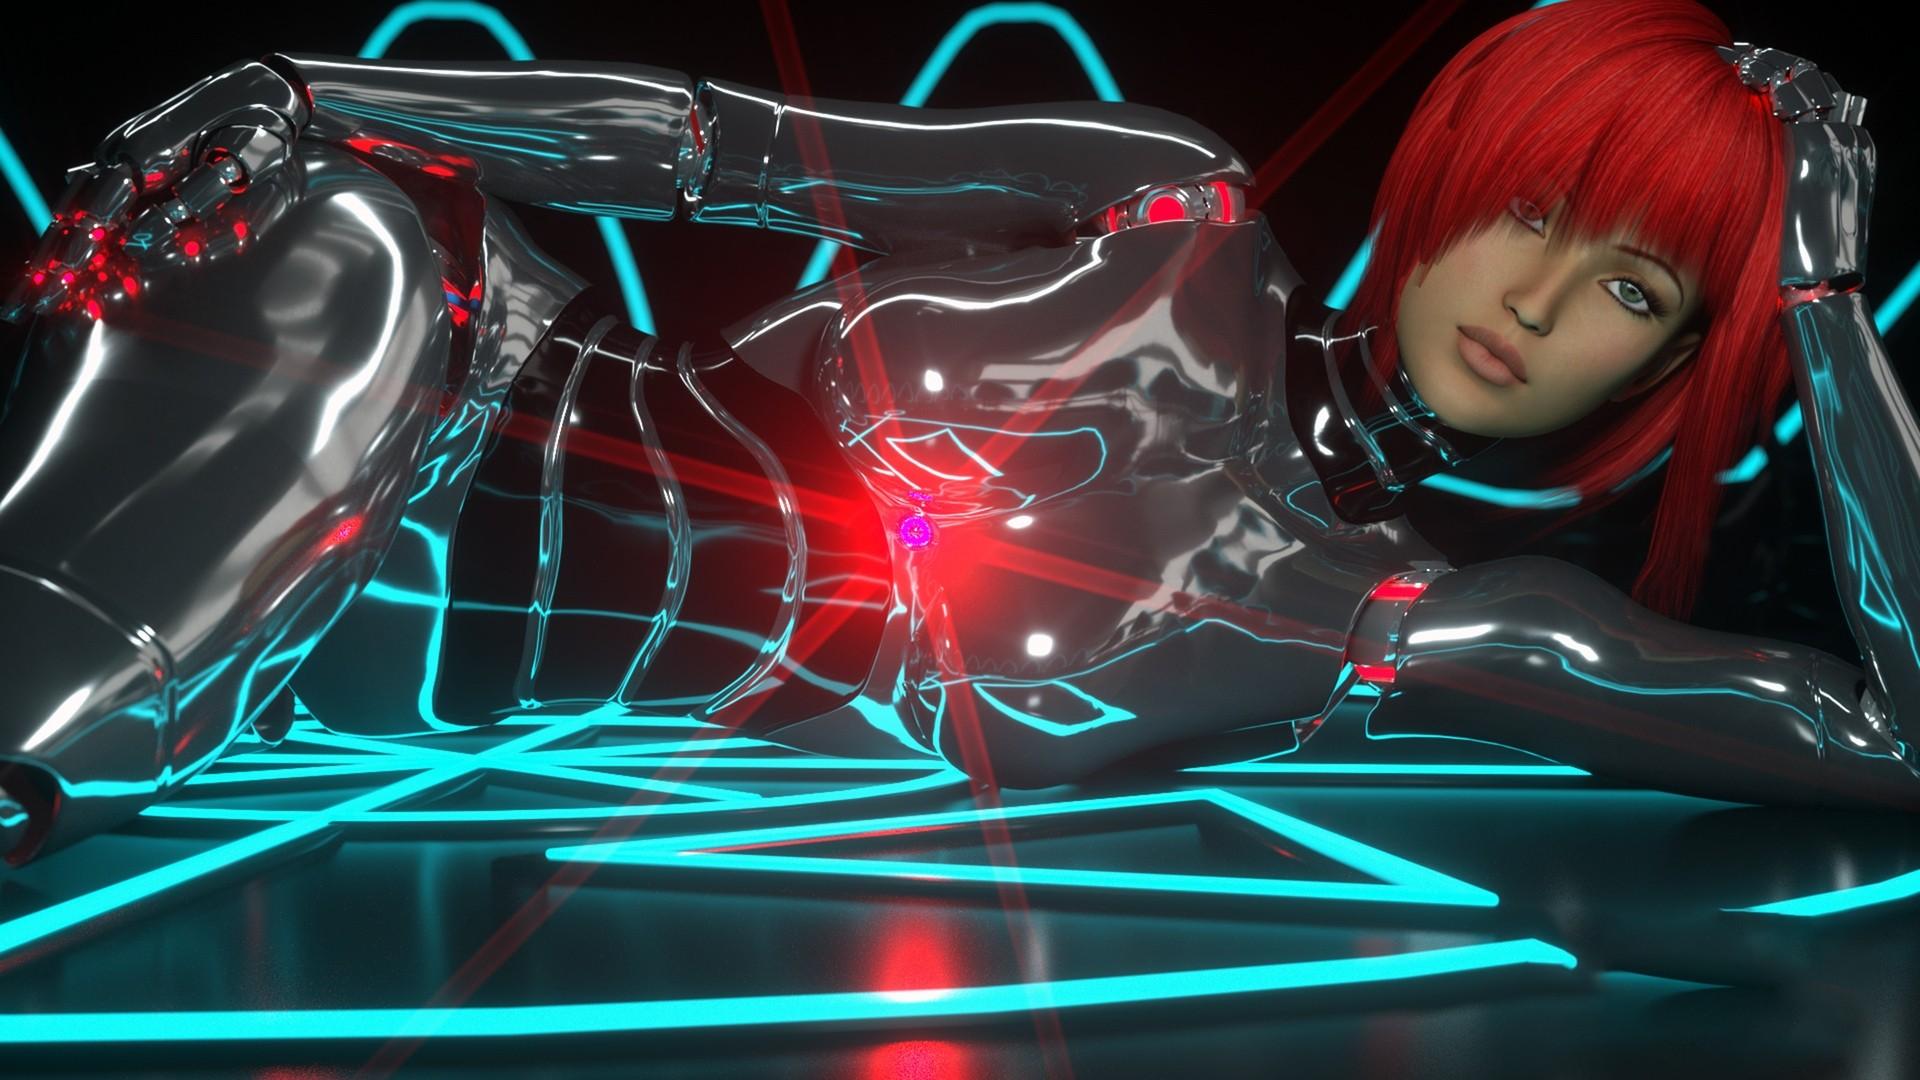 Cyborg Wallpaper Desktop